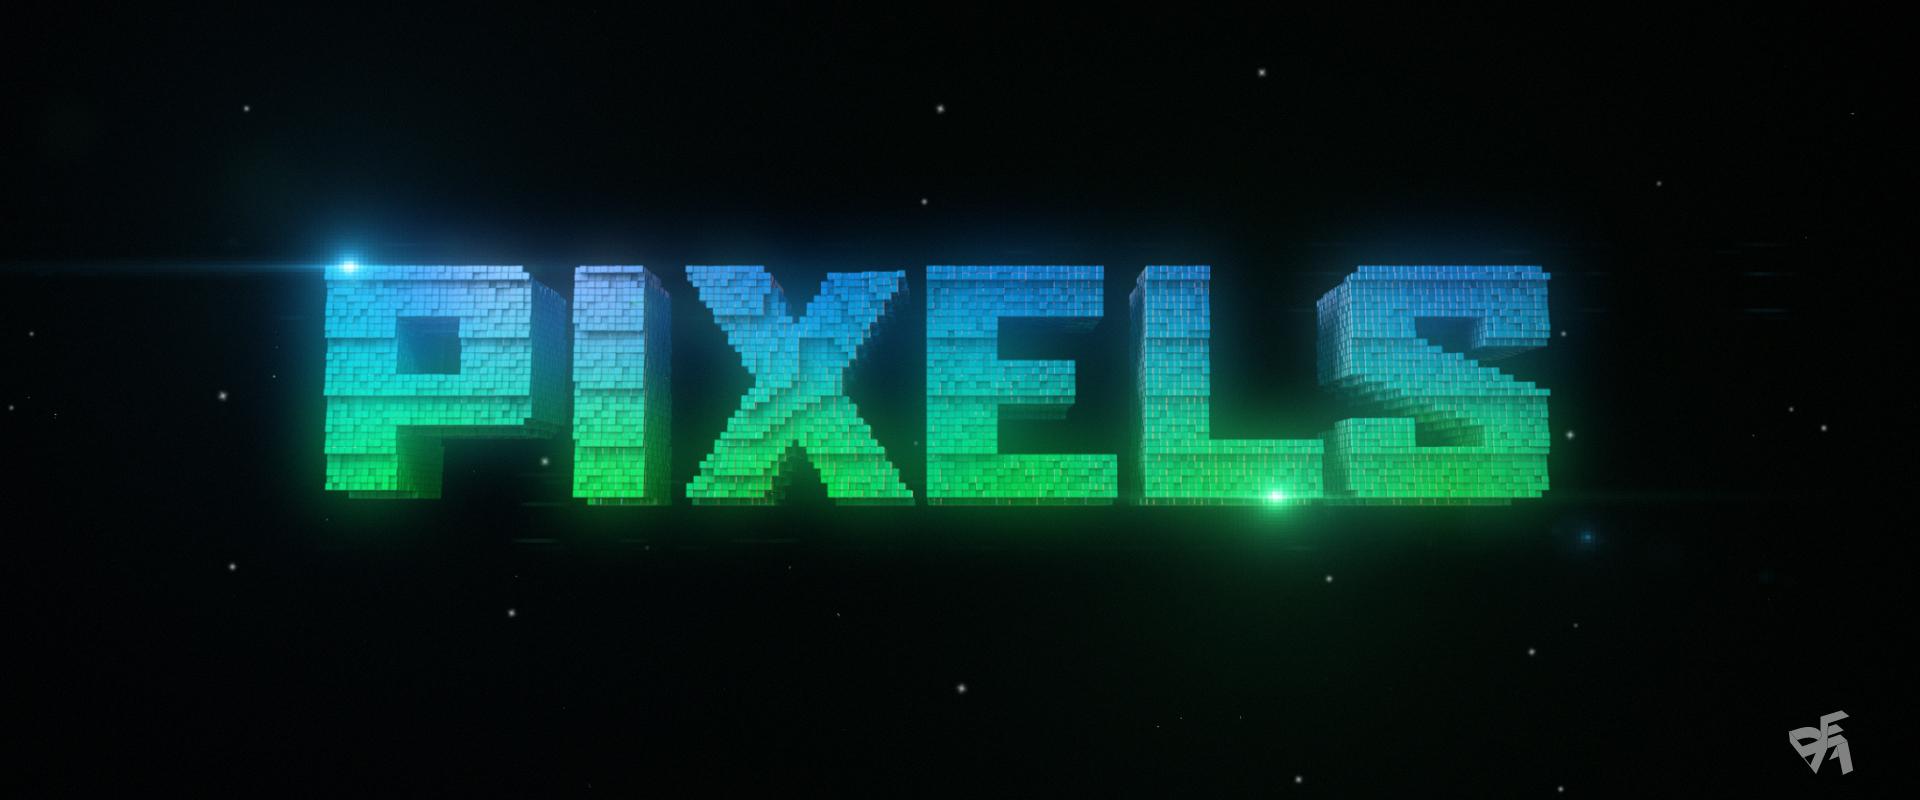 Pixels-STYLEFRAME_02.jpg